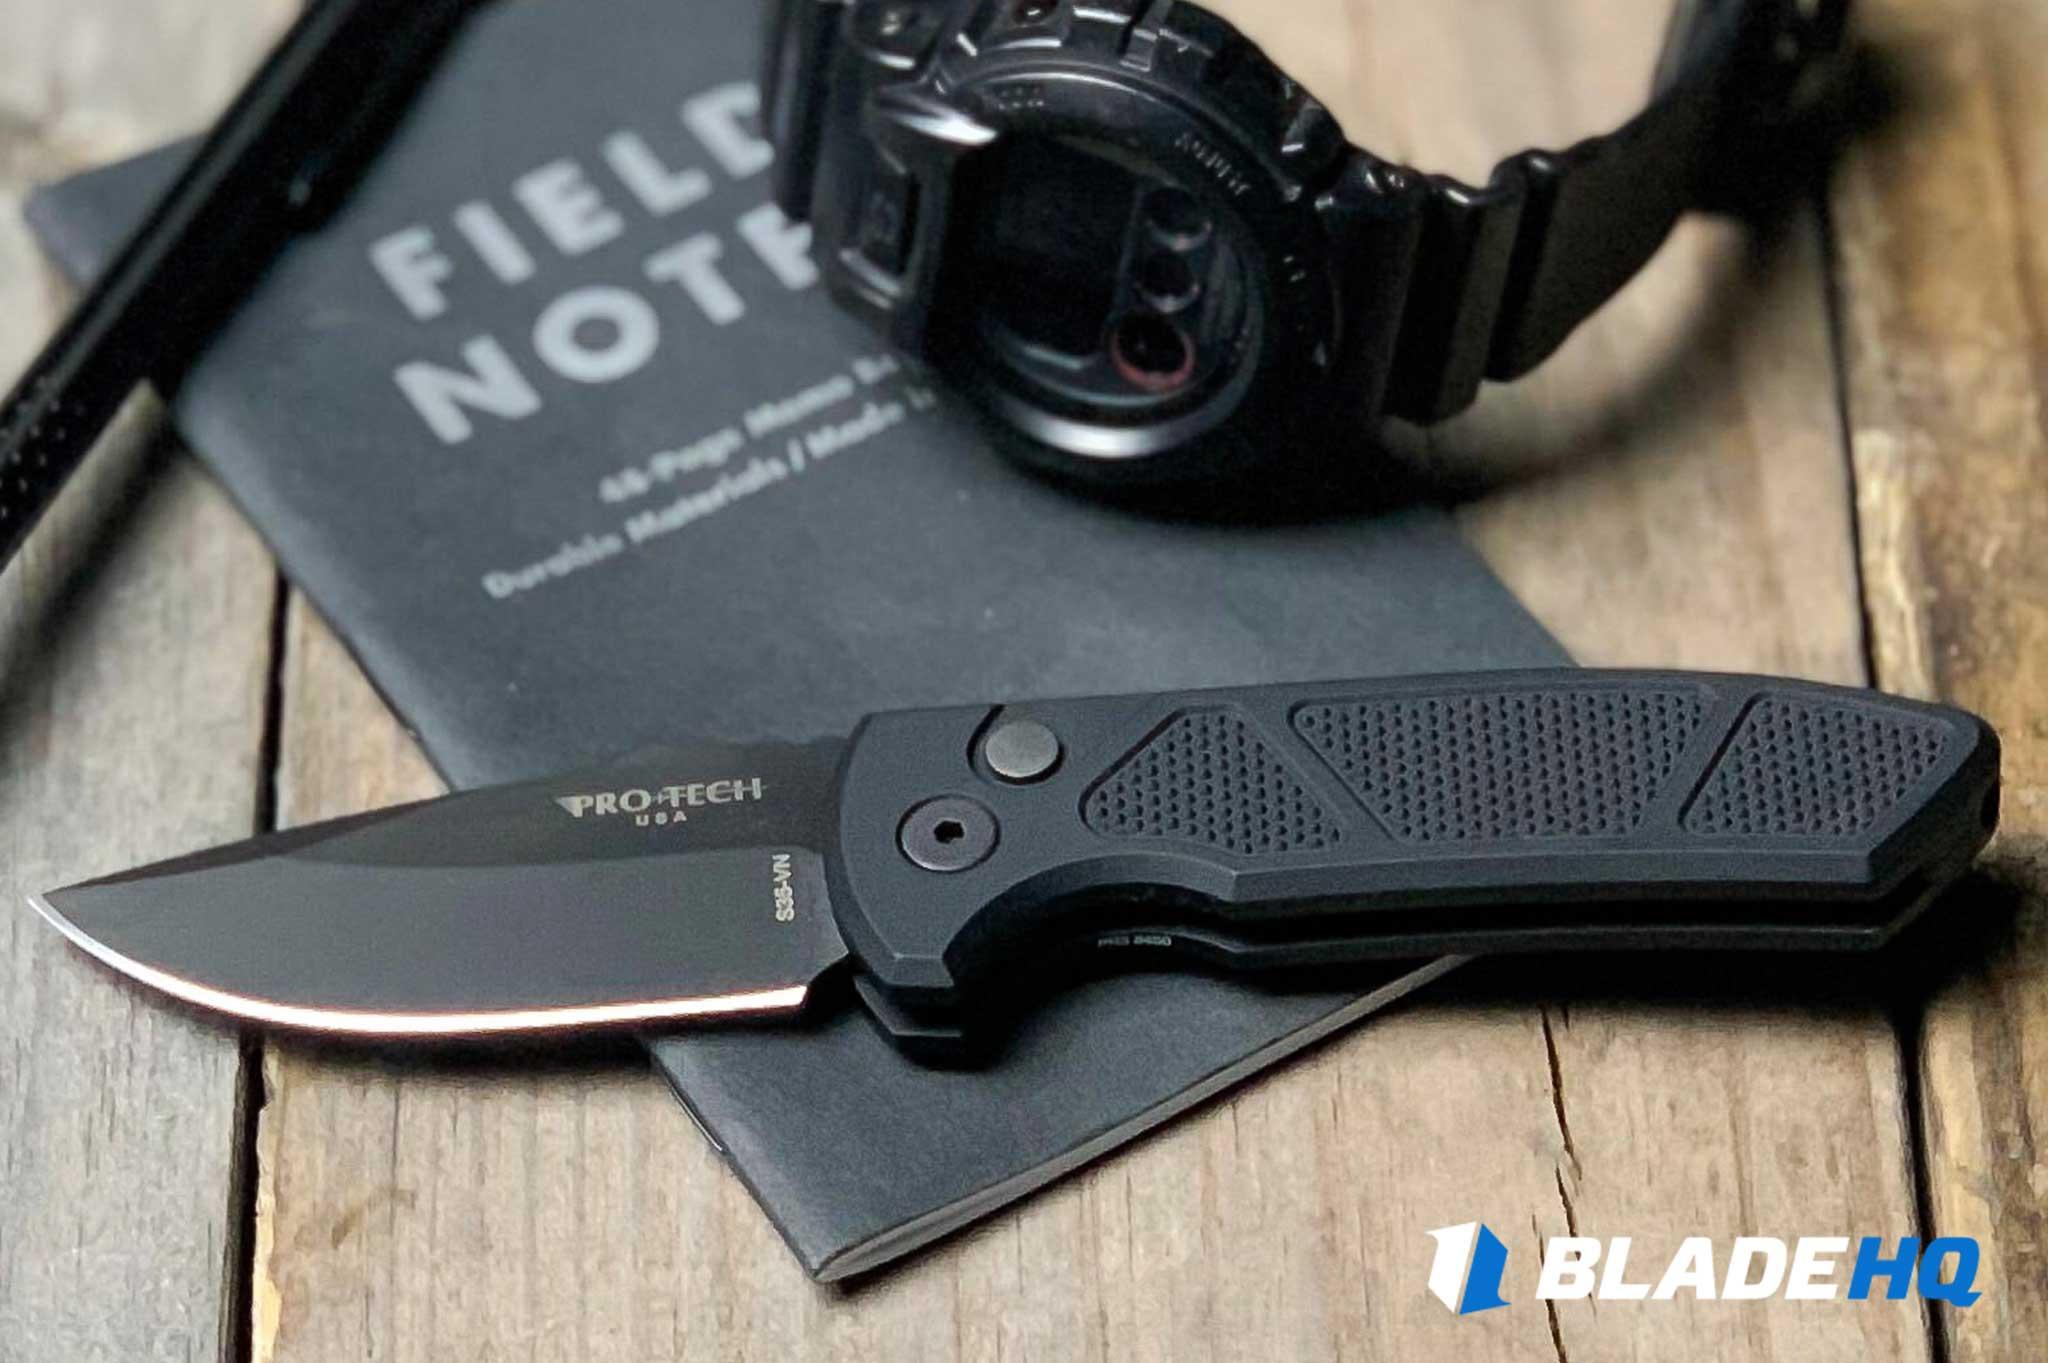 Pro-Tech SBR Knife Life Score